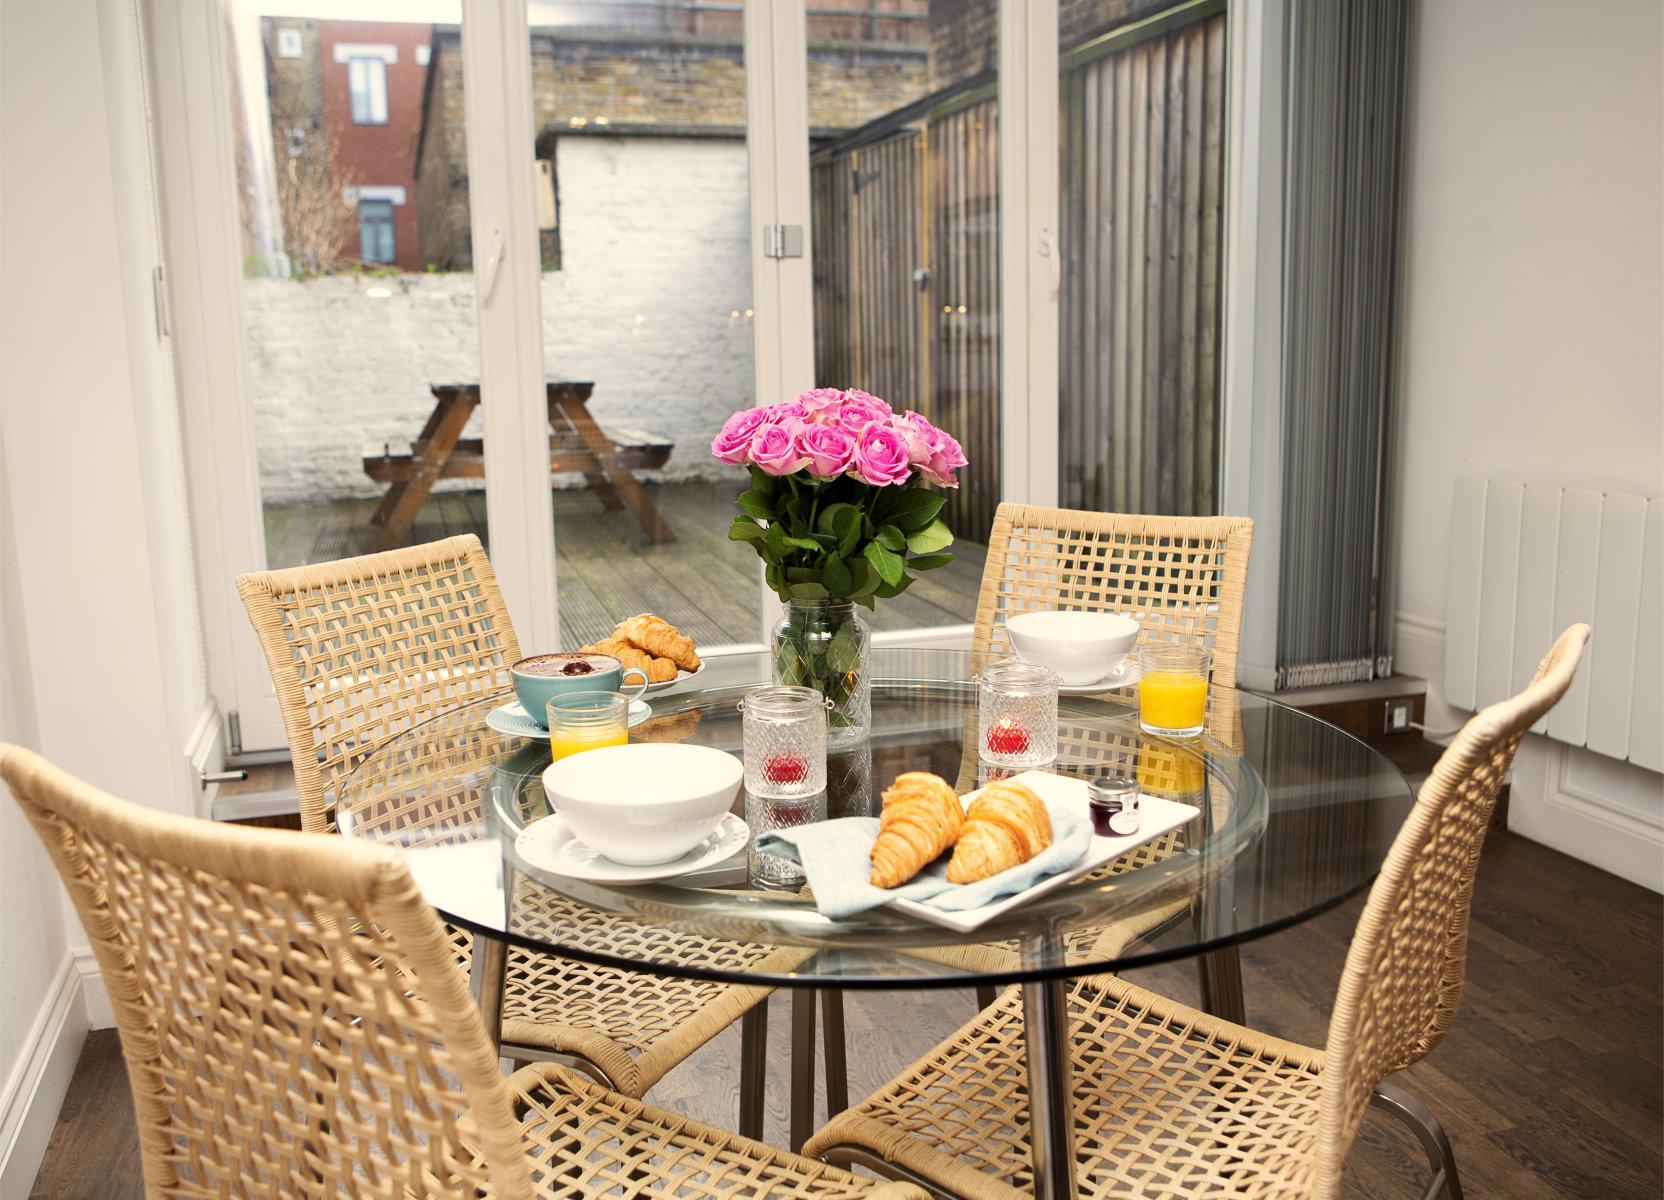 Trafalgar Square Serviced Apartments, Apartment 1, Covent Garden - Dining Area